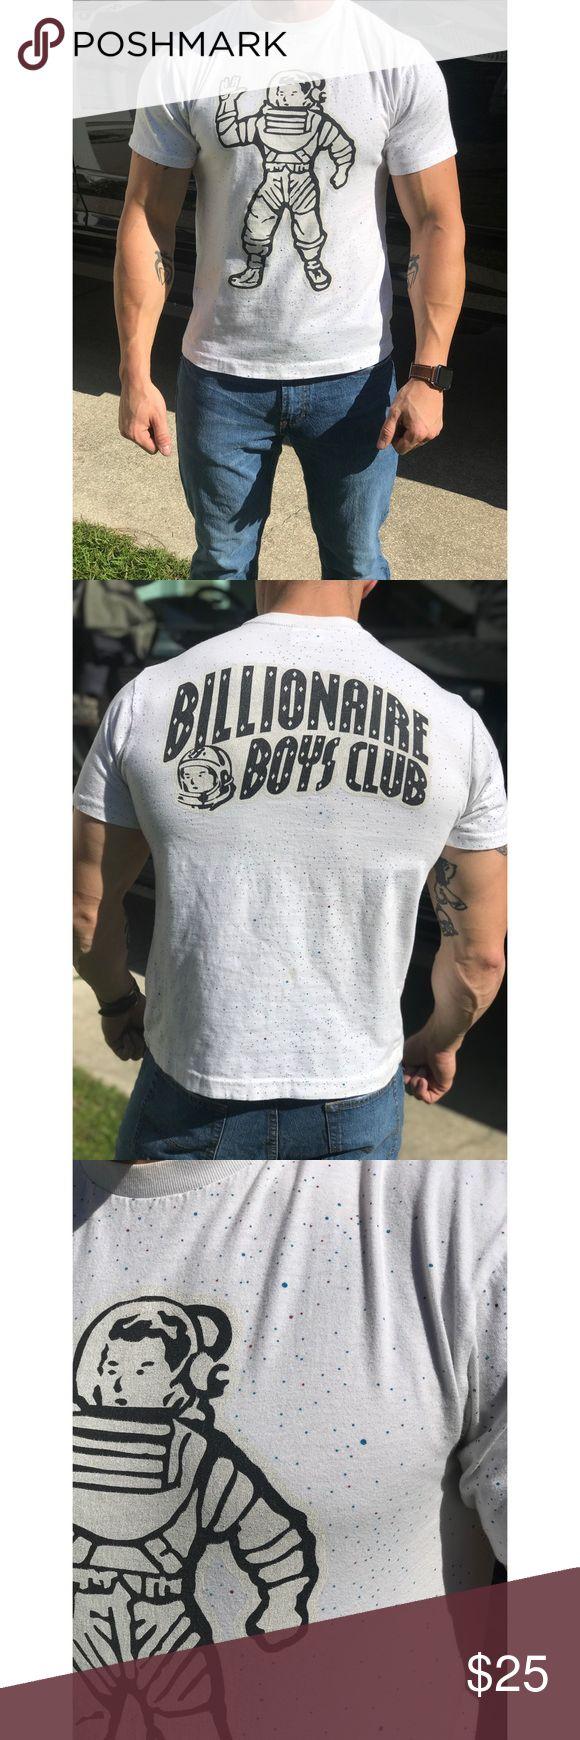 Billionaire Boys Club T-shirt Size: M Billionaire Boys Club Astronaut T-shirt Size : M Billionaire Boys Club Shirts Tees - Short Sleeve